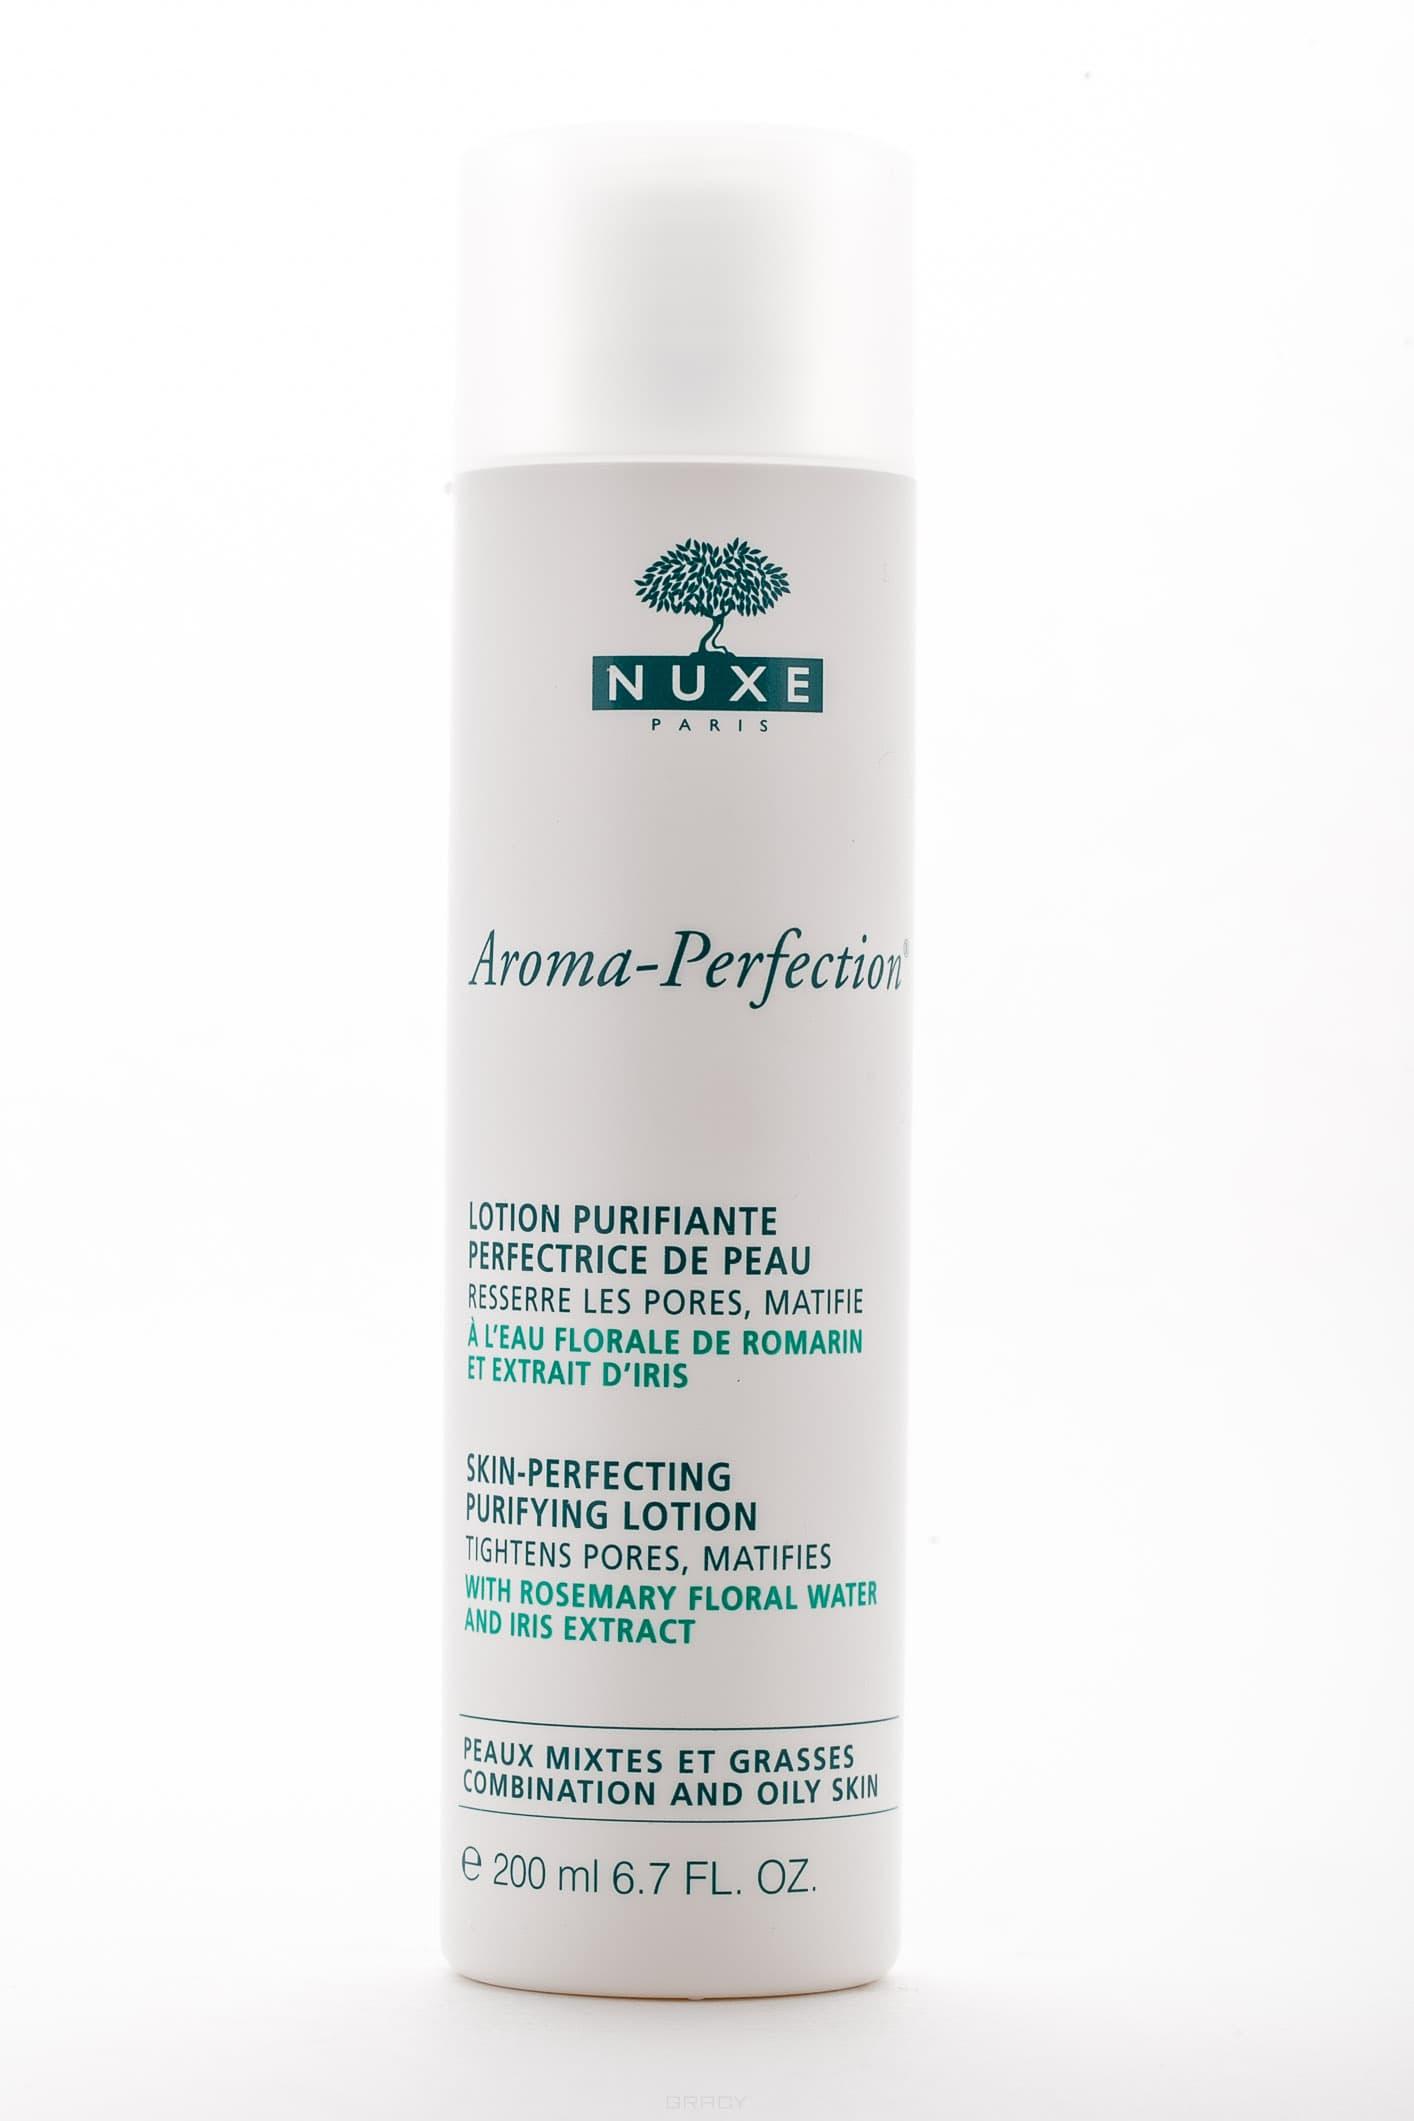 Nuxe Матирующий лосьон Aroma-Perfection, 200 мл лосьон для лица